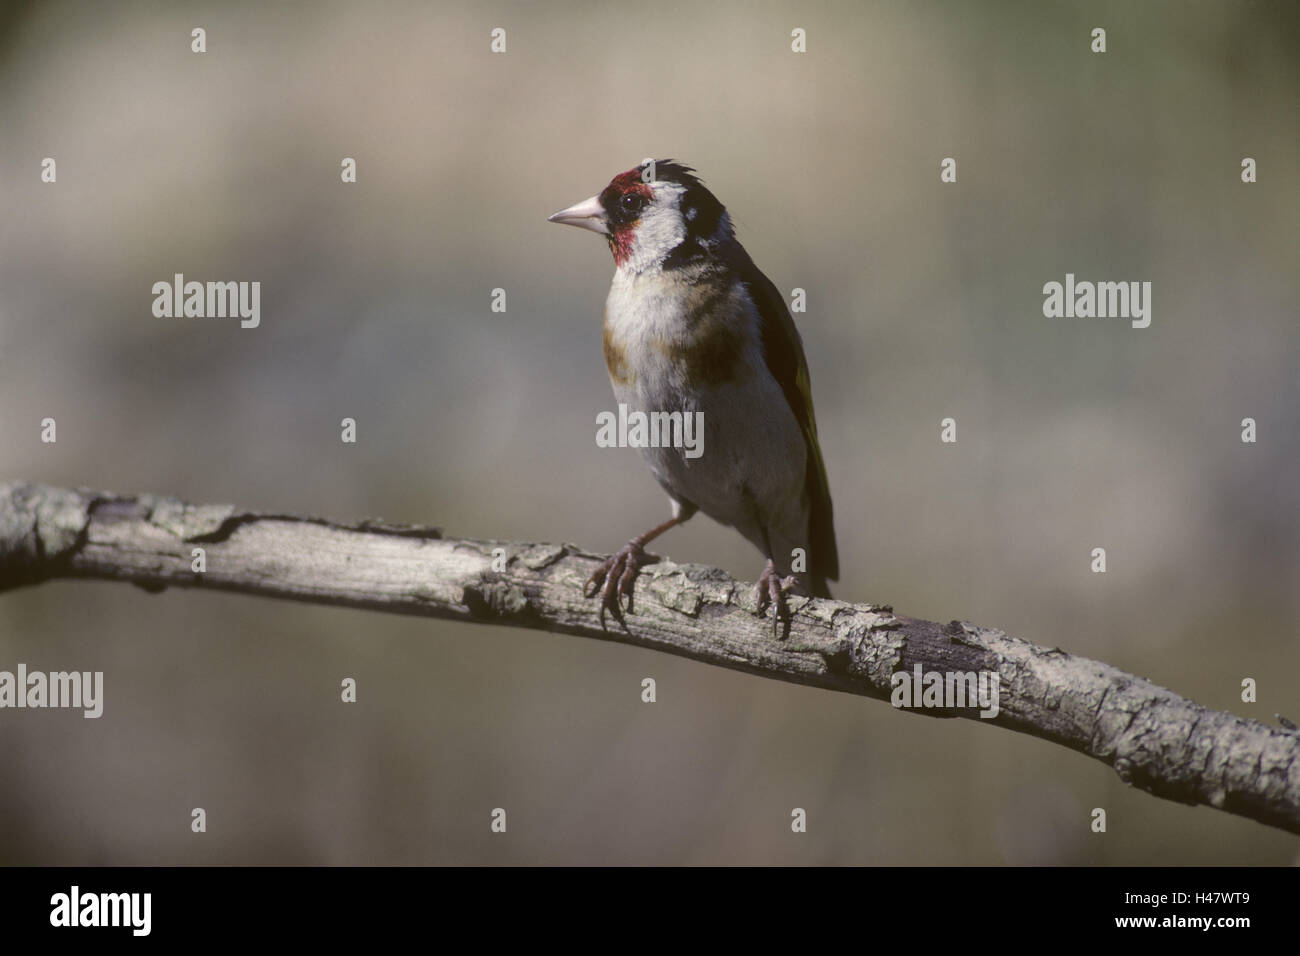 Goldfinch, Carduelis carduelis, branch, sit, - Stock Image